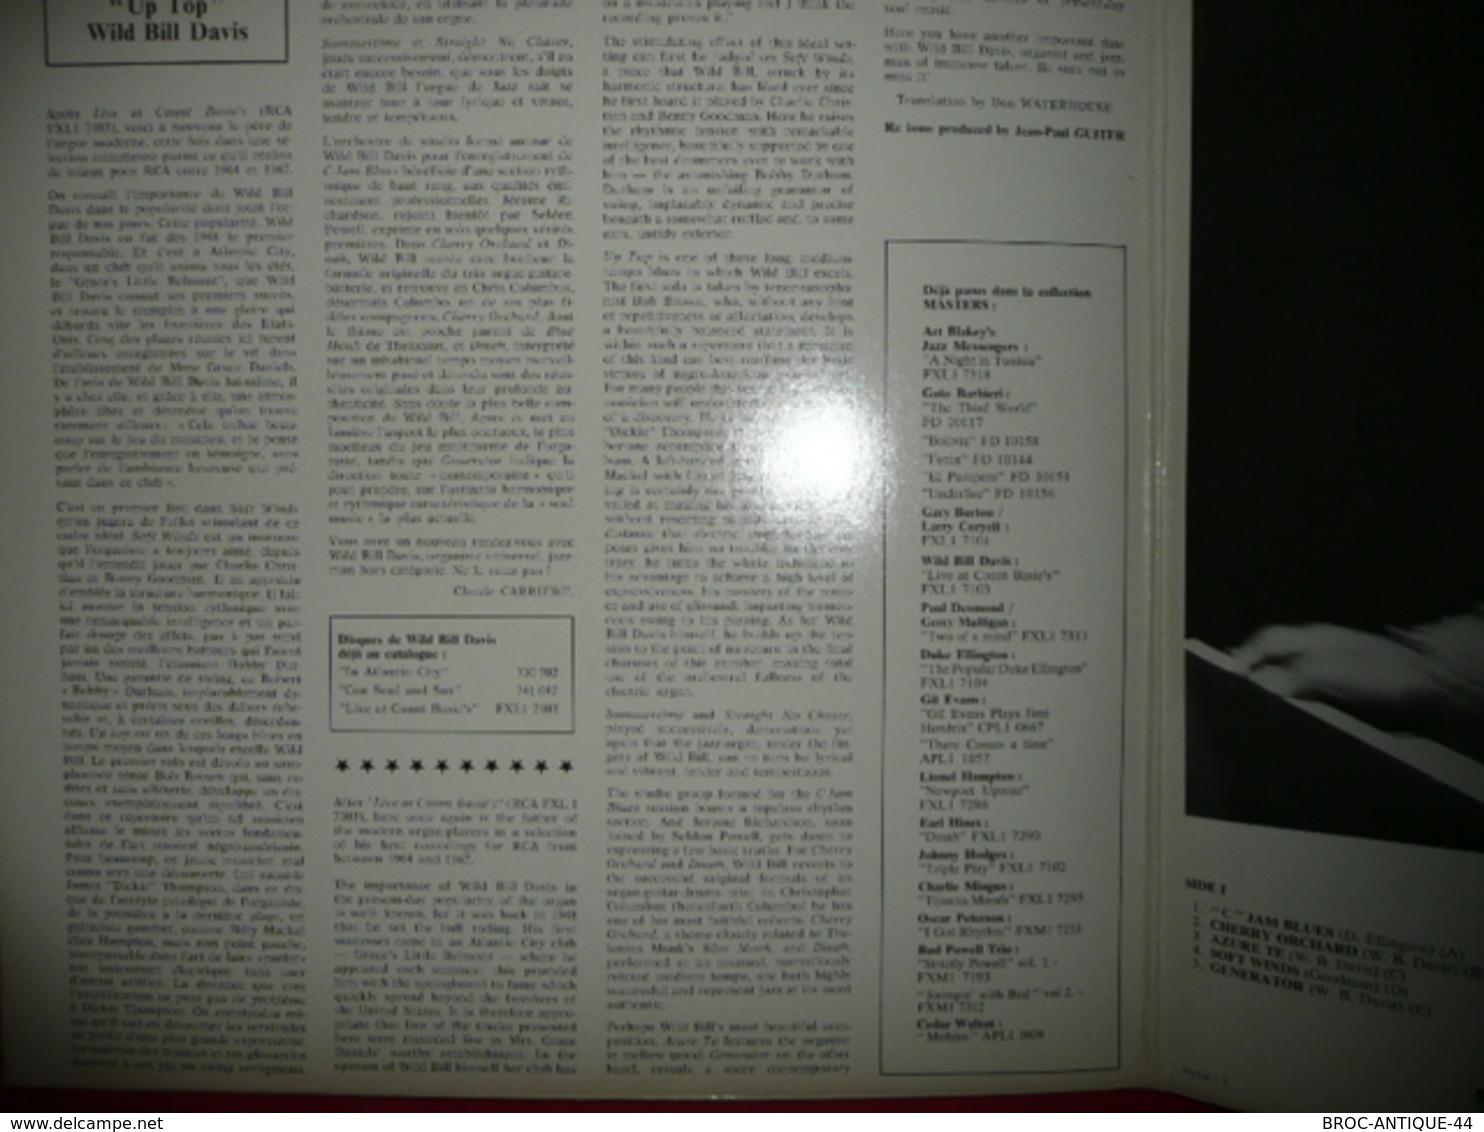 LP N°1661 - WILD BILL DAVIS - UP TOP - COMPILATION 10 TITRES - Jazz